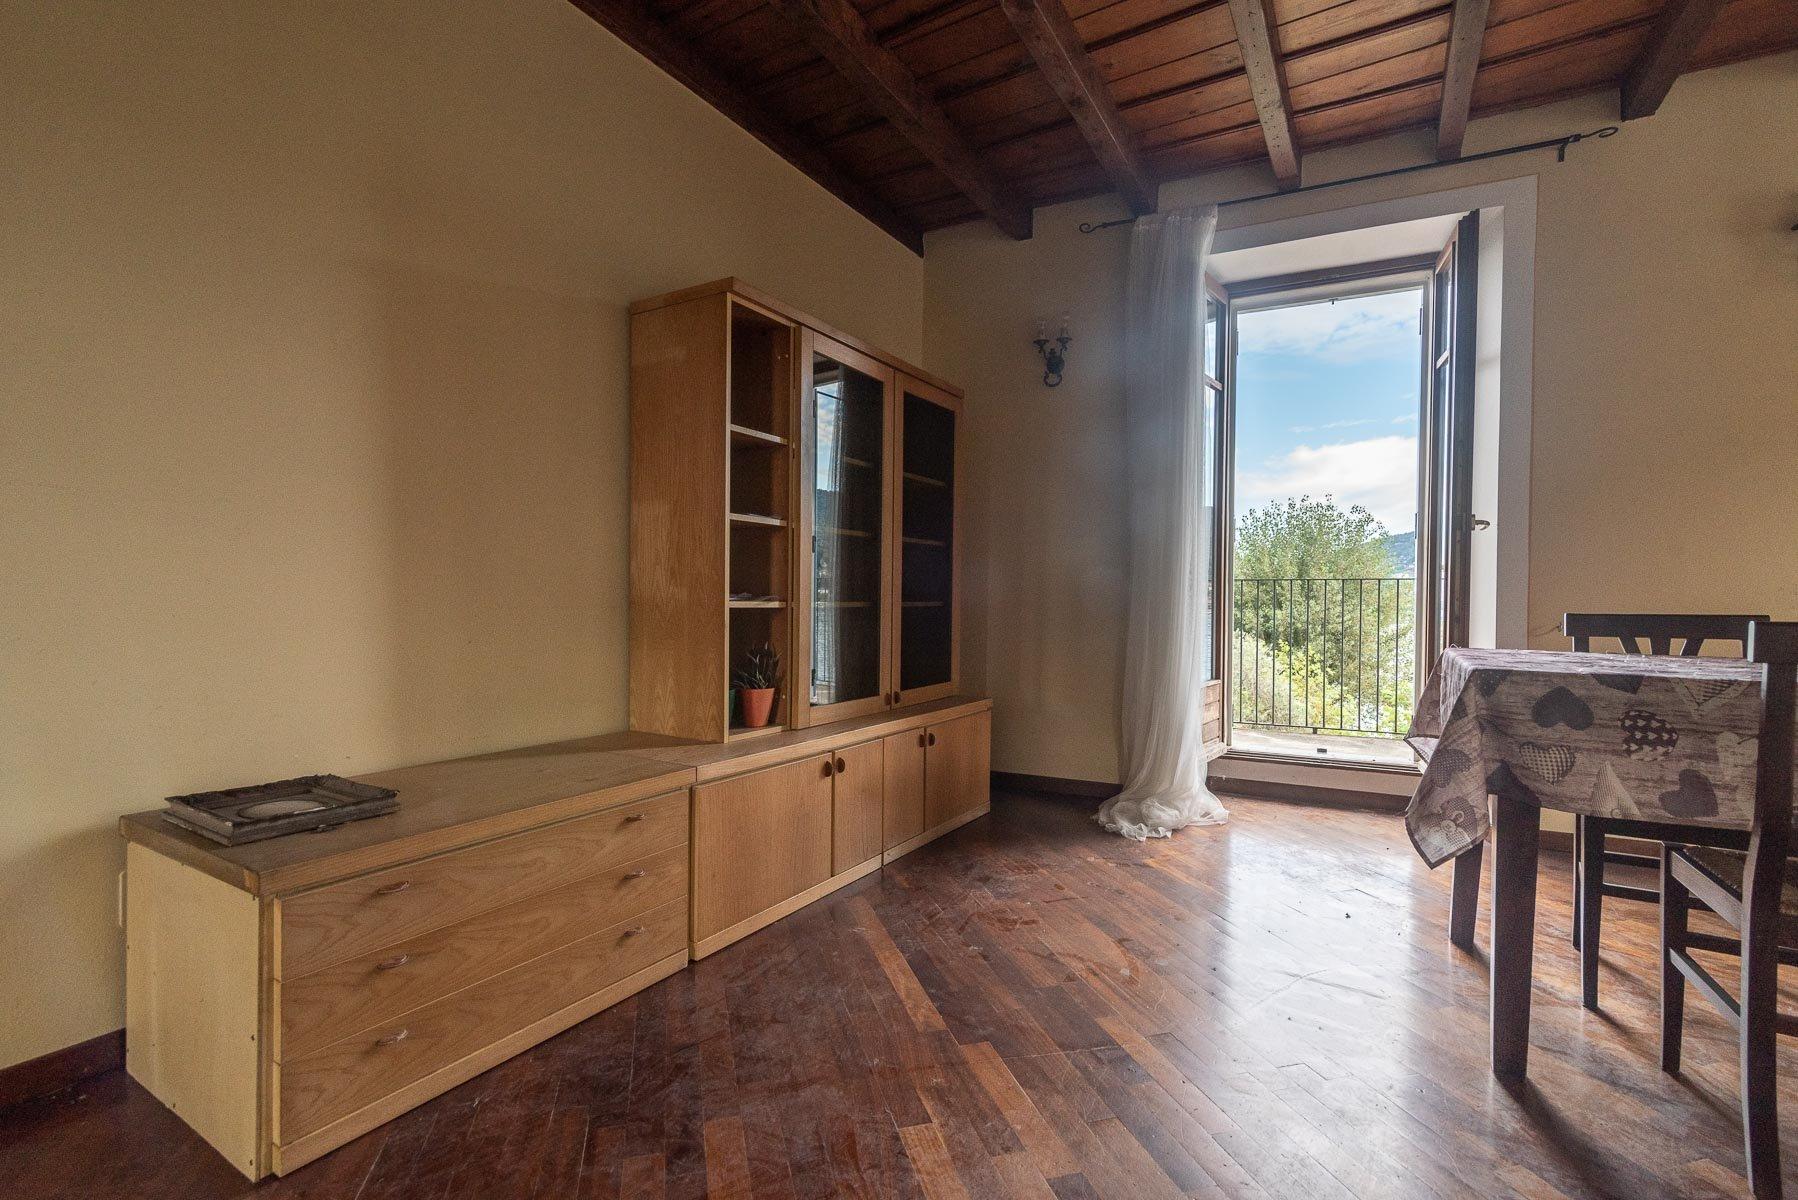 Apartment for sale in Pescatori Island, Stresa - living room